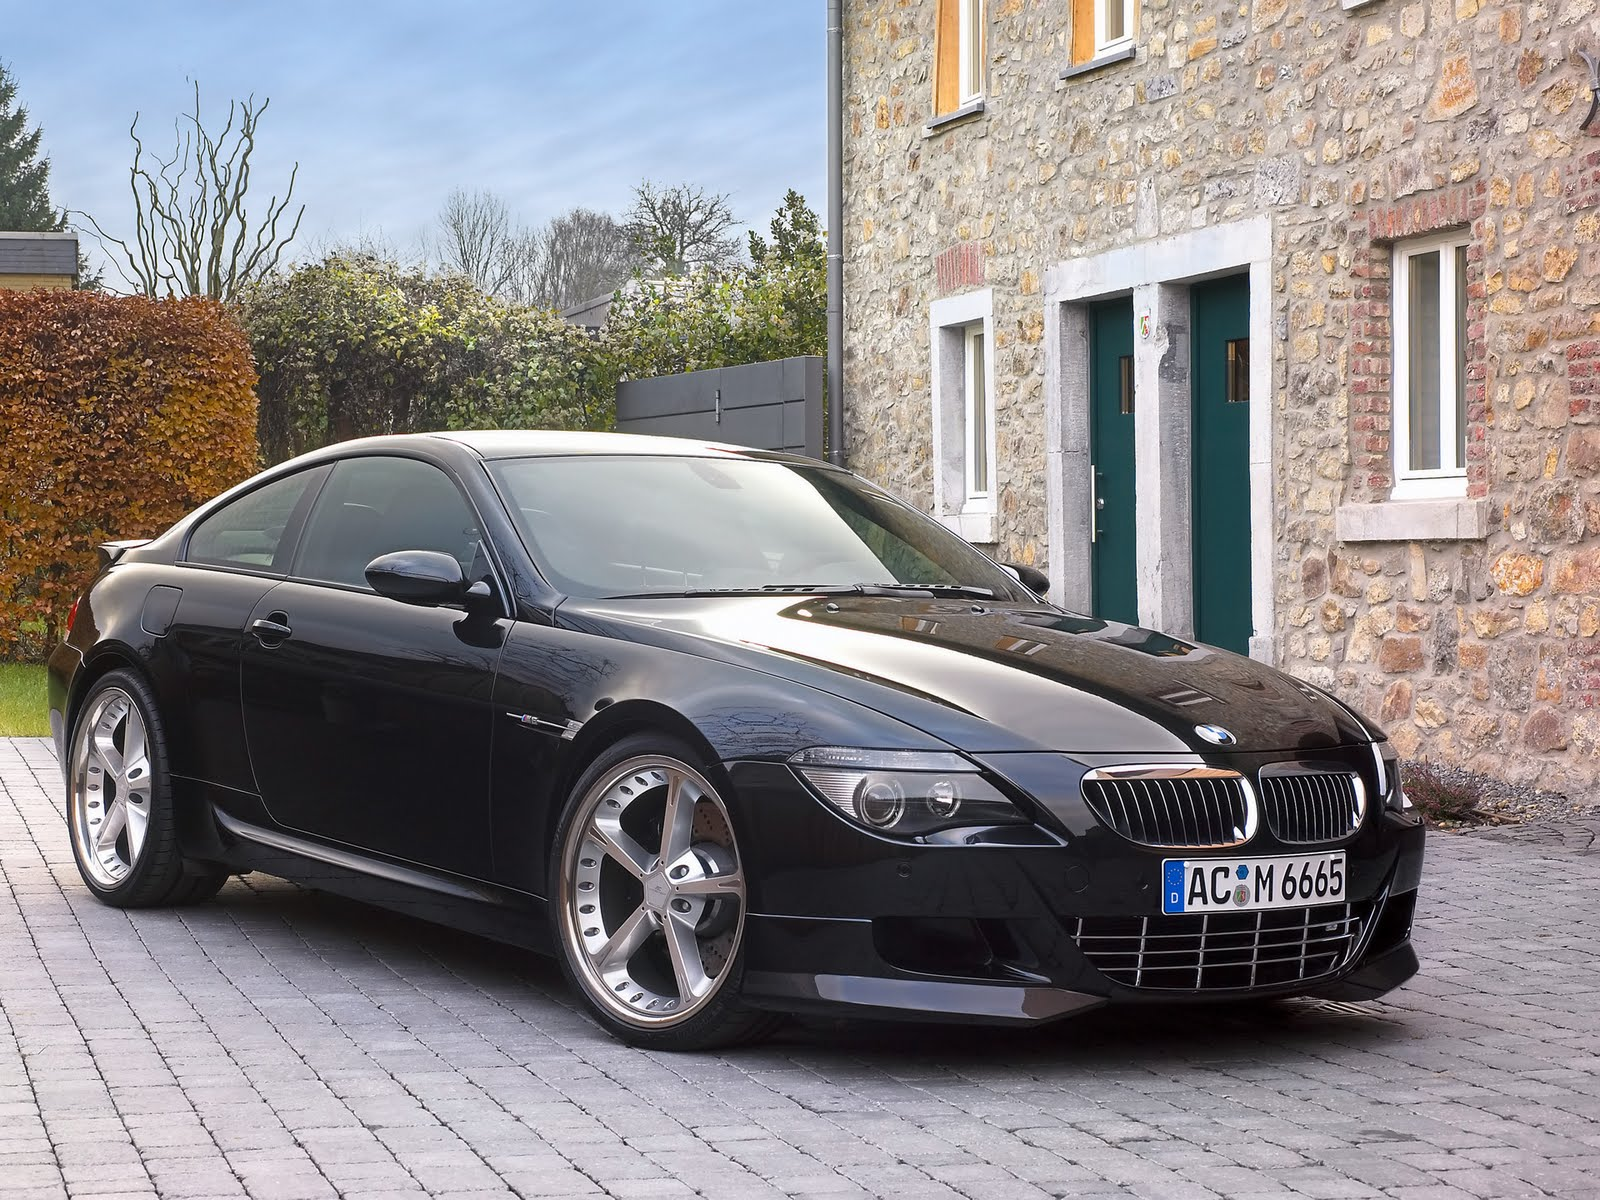 Black BMW Cars Tus Gallery - Black bmw car